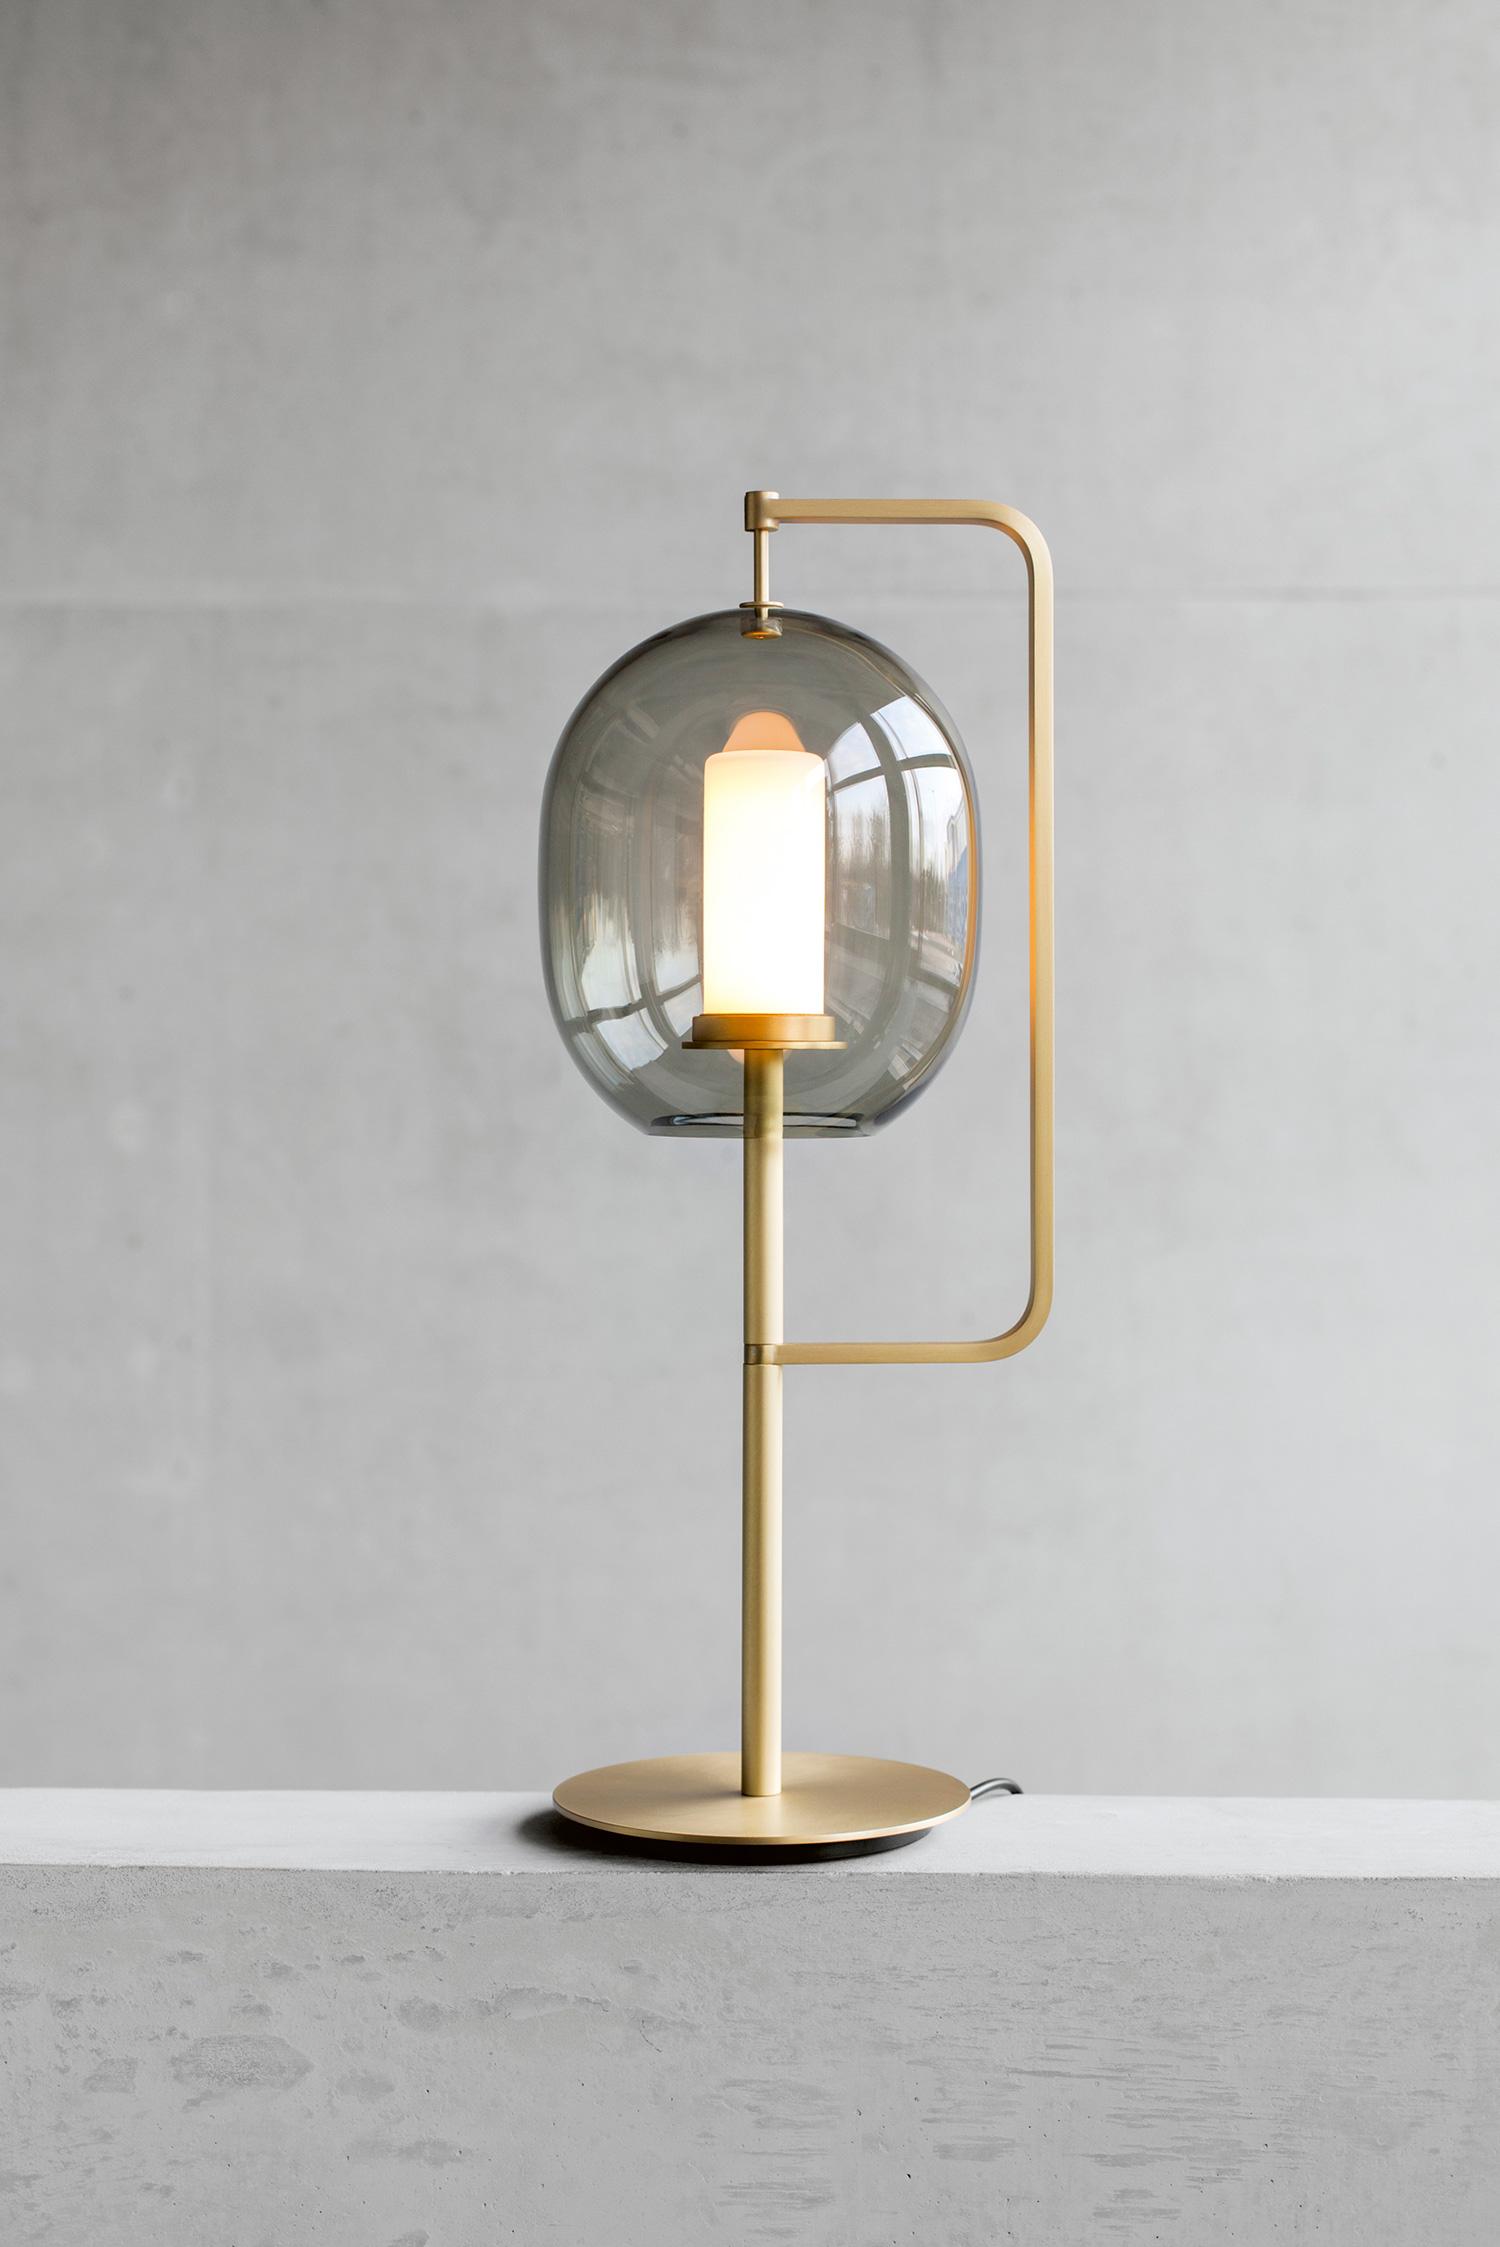 Lantern Light by ClassiCon at Salone del Mobile 2017 | Yellowtrace